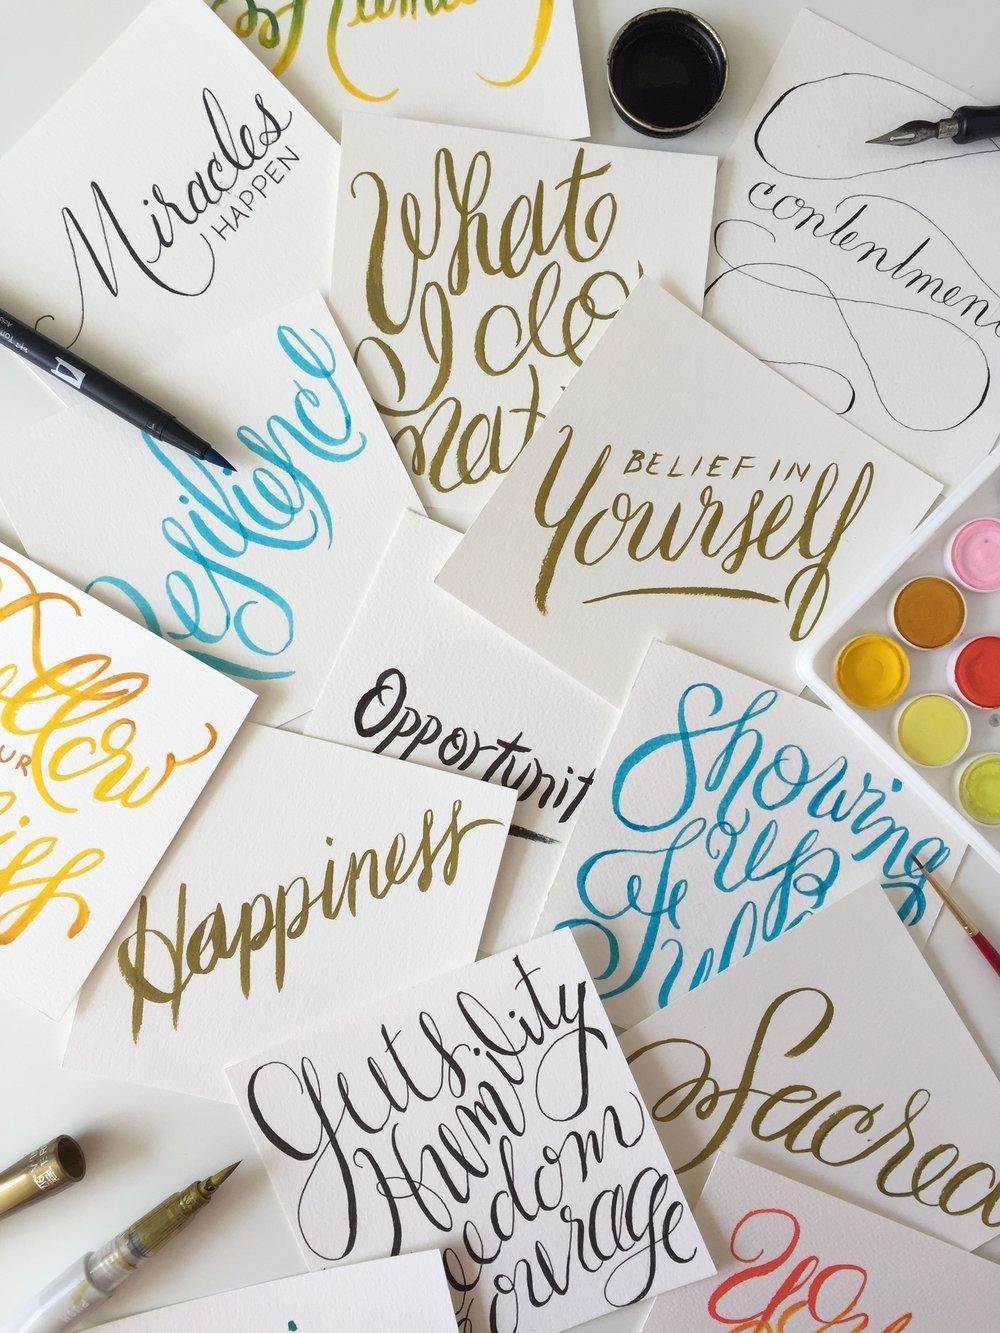 HANDLETTERING - brush lettering • pointed pen calligraphy